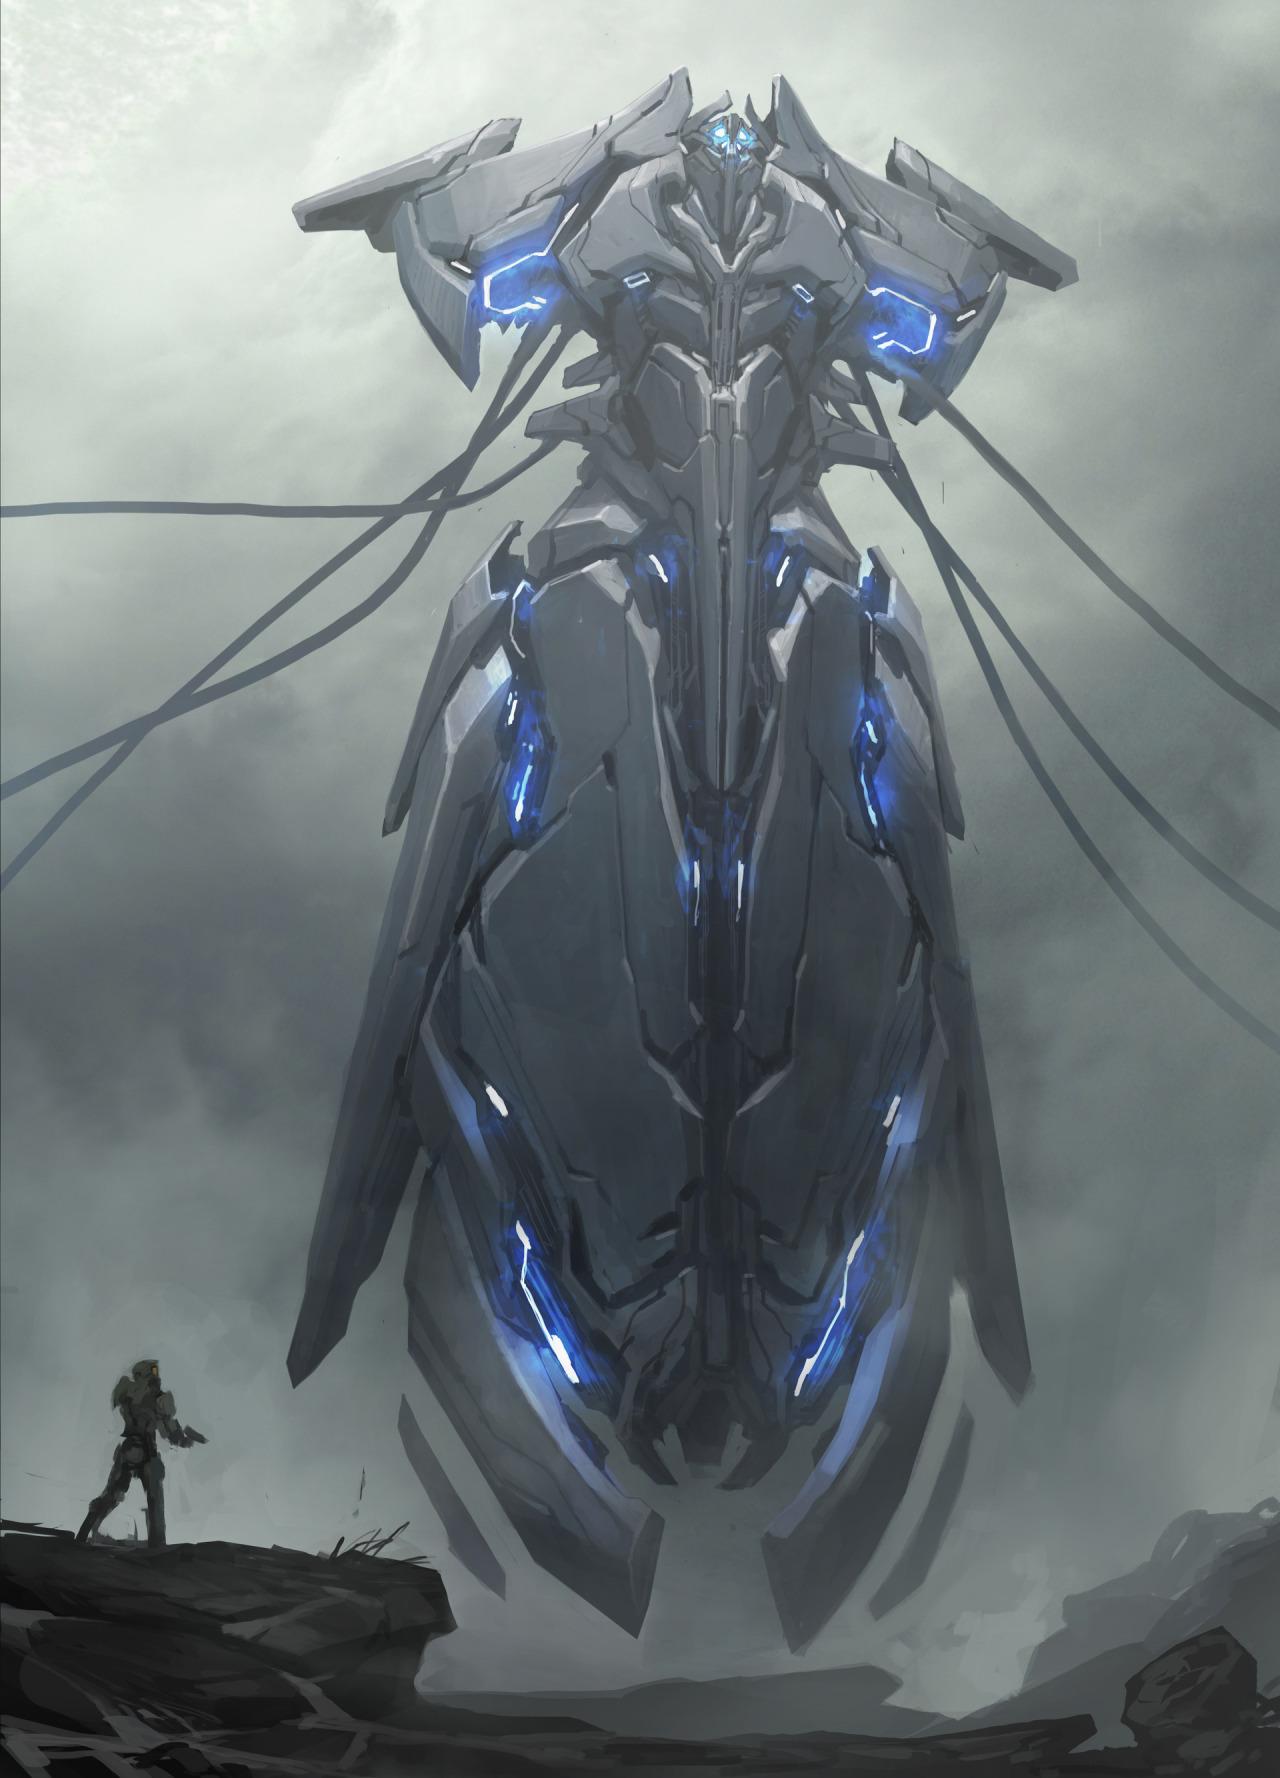 Concept Art Halo 5